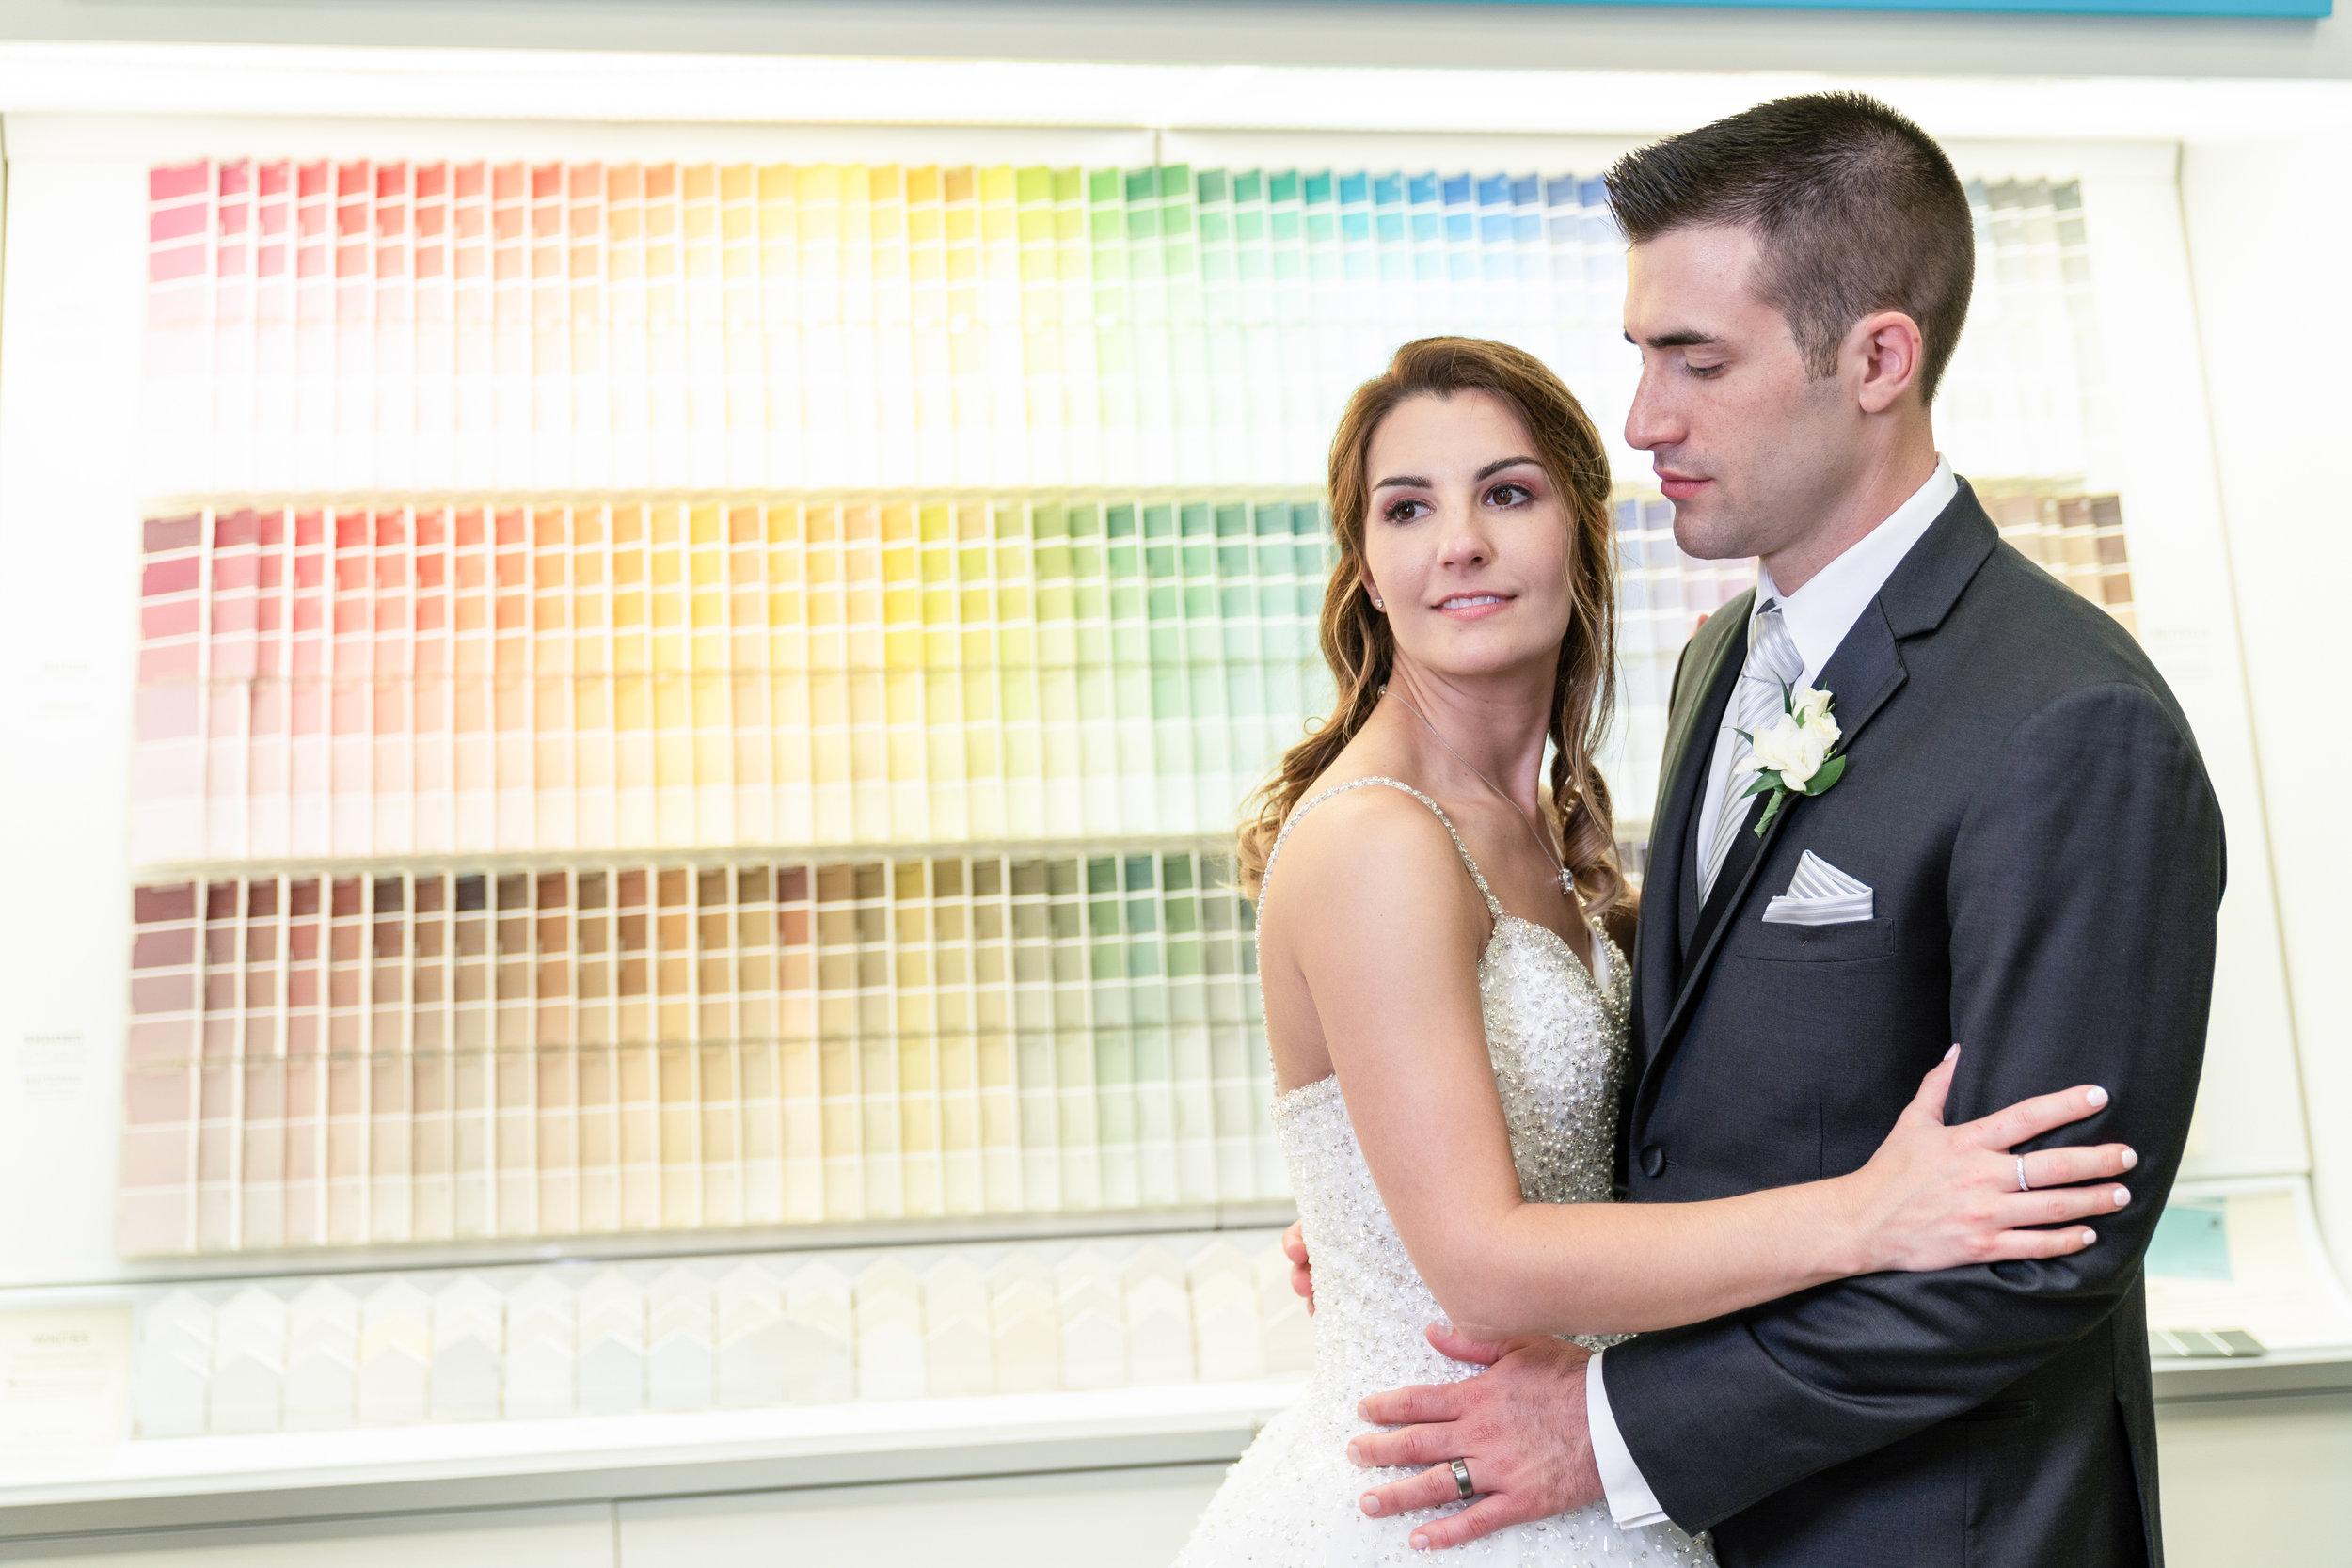 Wedding-couple-takes-photos-at-lowes-hardware-due-to-rain1.jpg